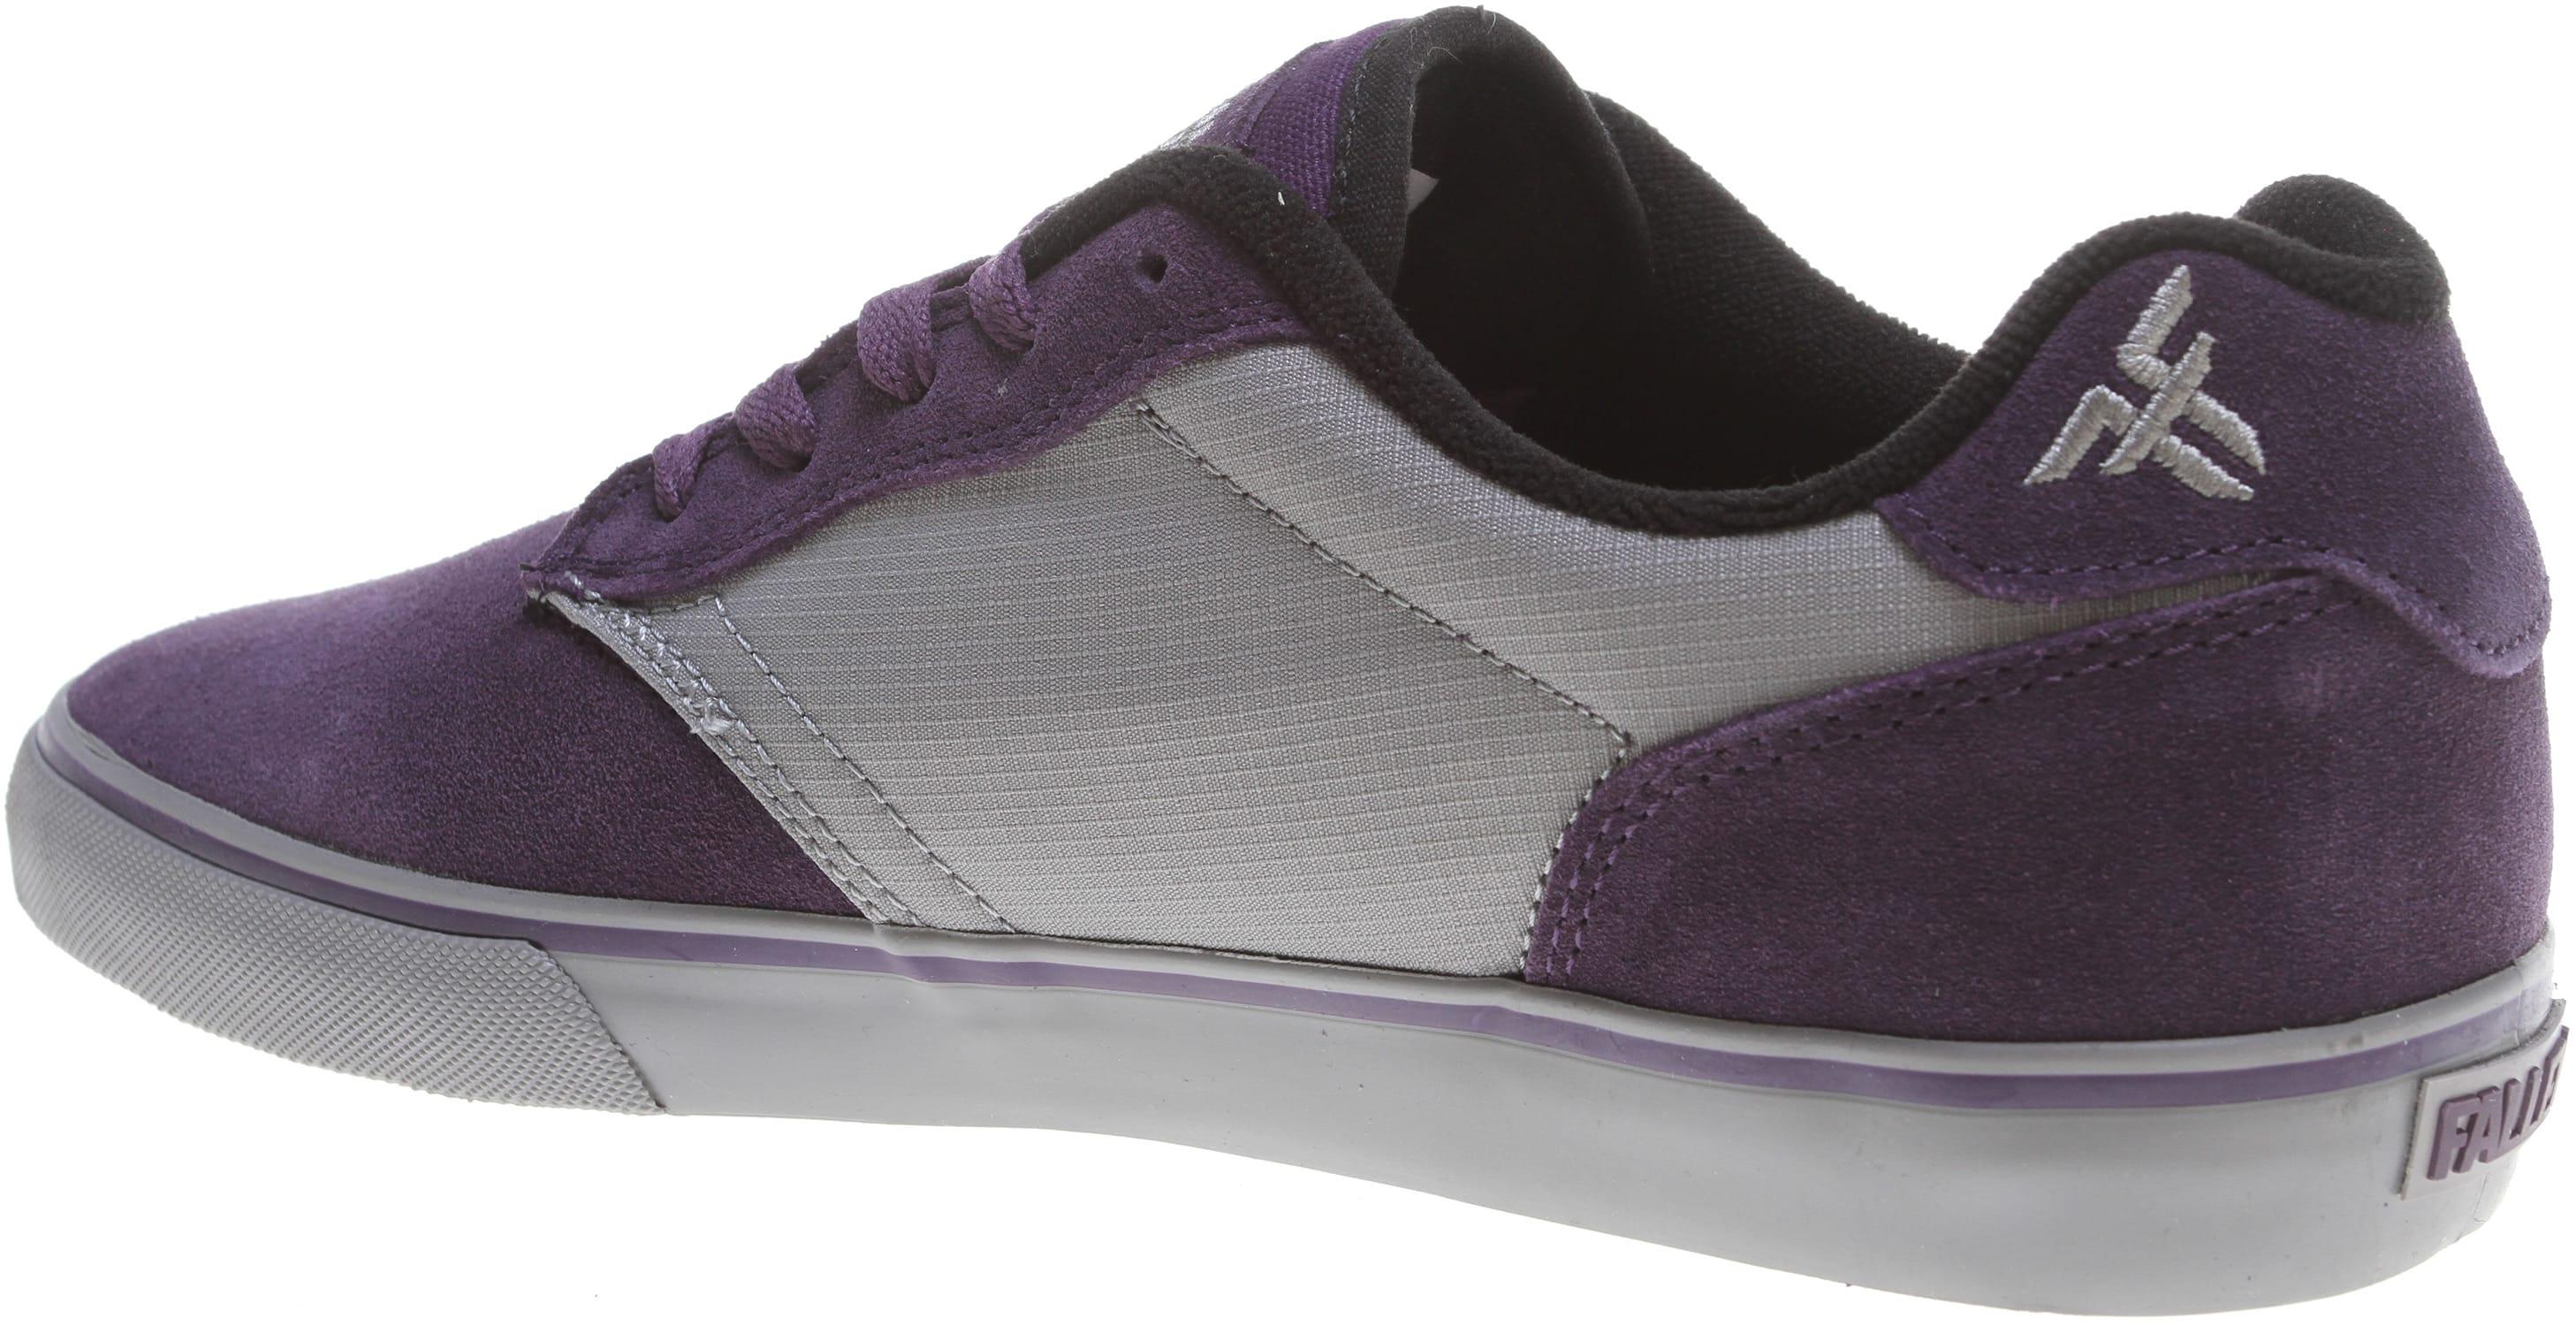 a580474f0f Fallen Slash Skate Shoes - thumbnail 3